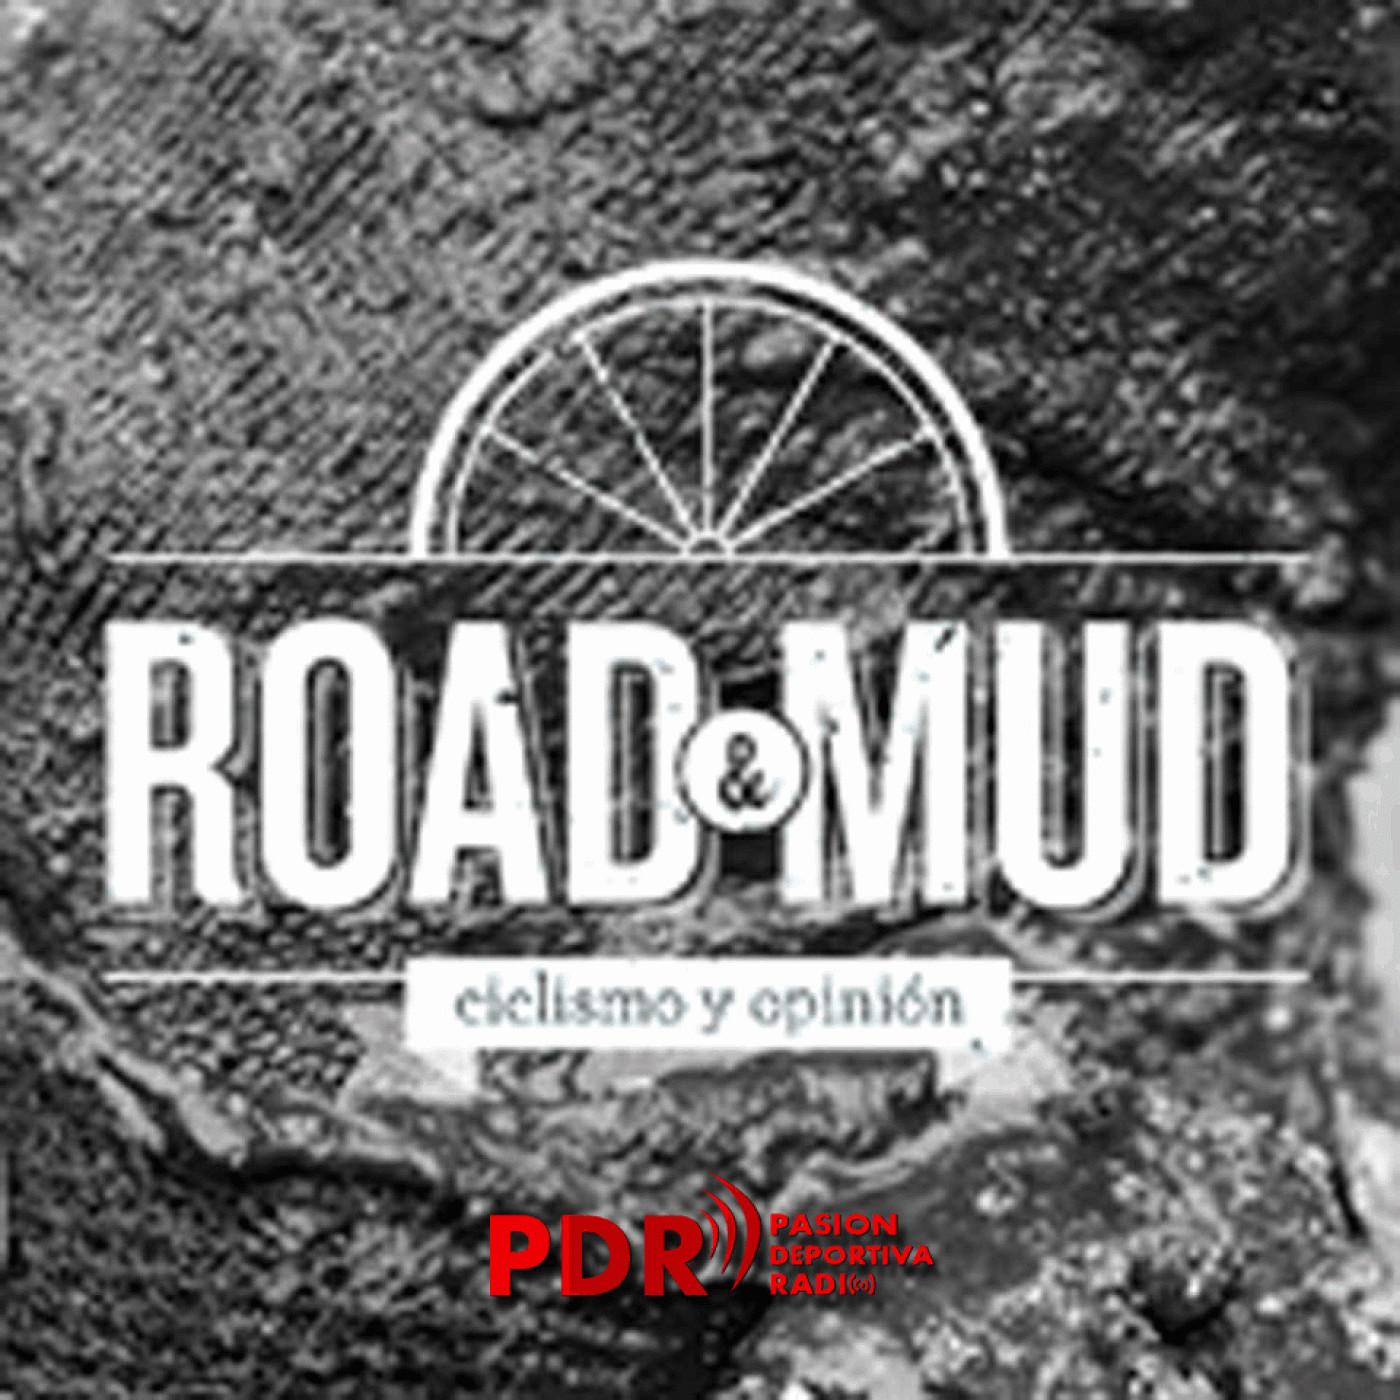 <![CDATA[Programa Road&Mud]]>